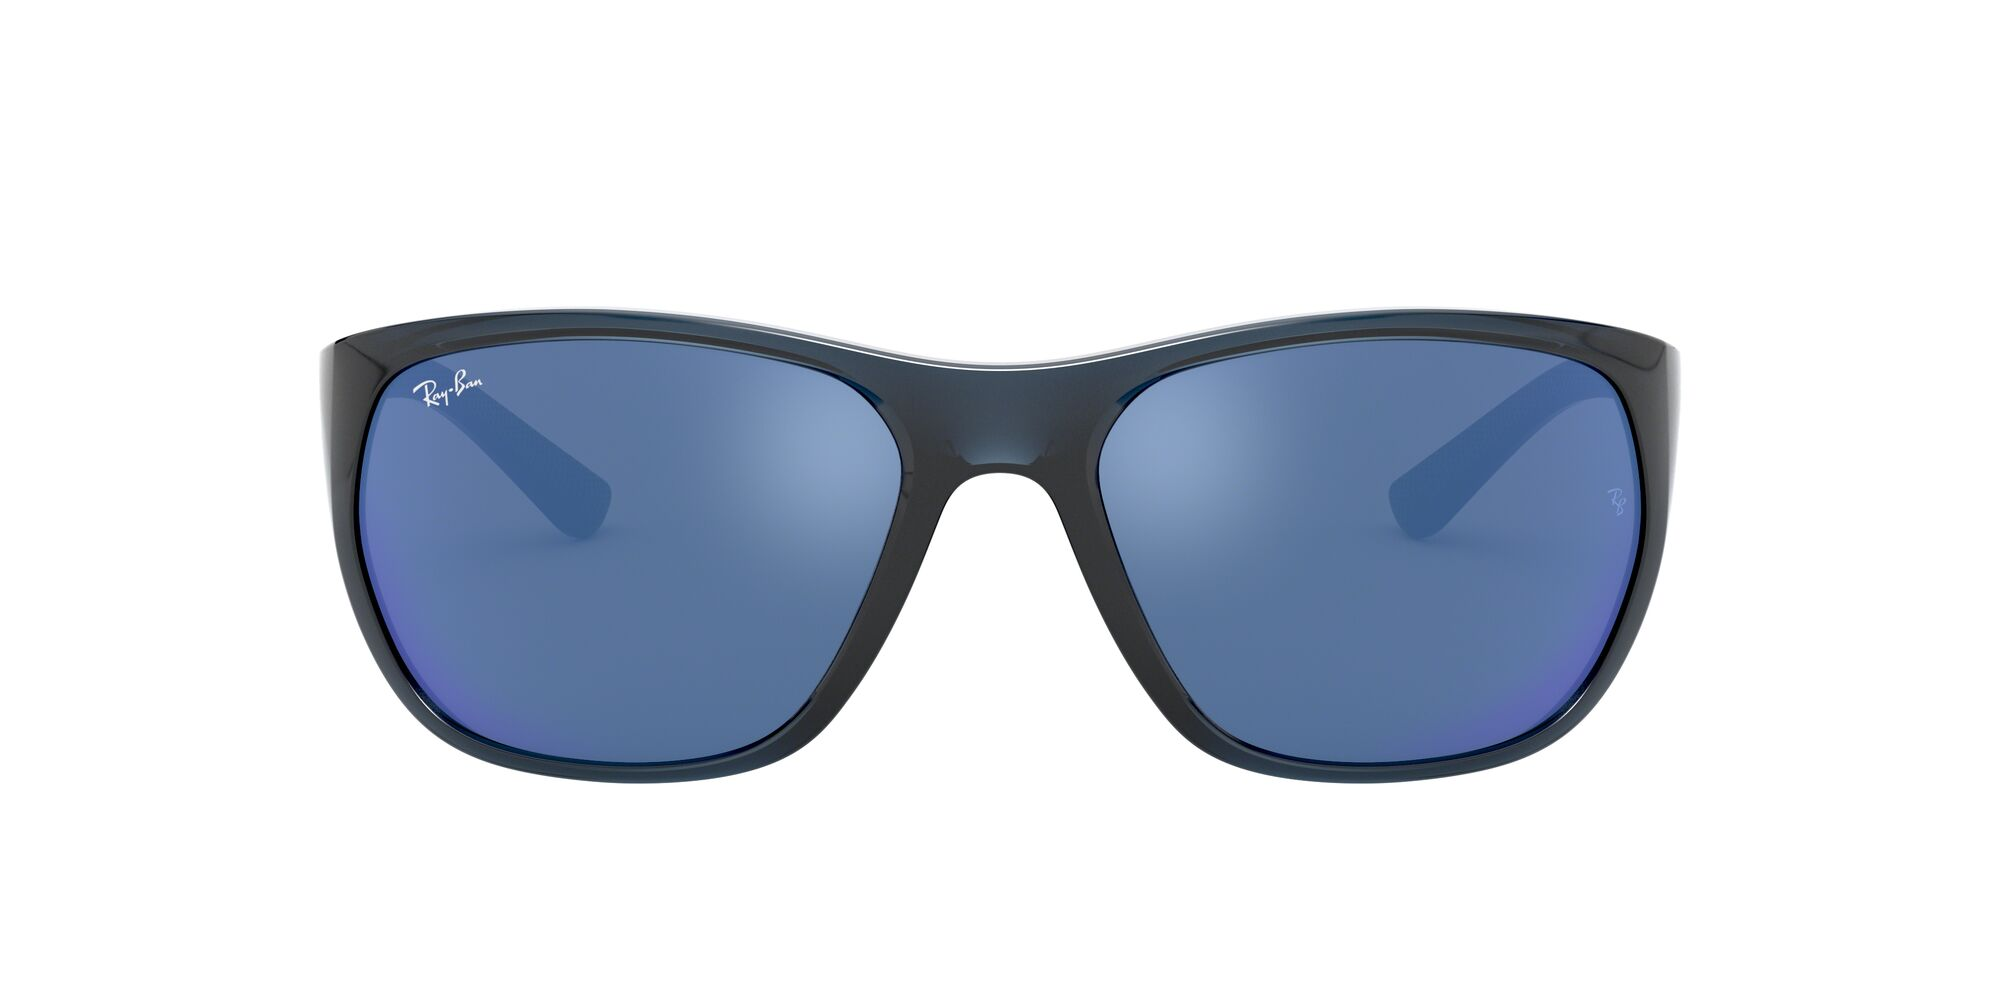 Front Ray-Ban Ray-Ban 0RB4307 643855 61/18 Blauw, Transparant/Blauw